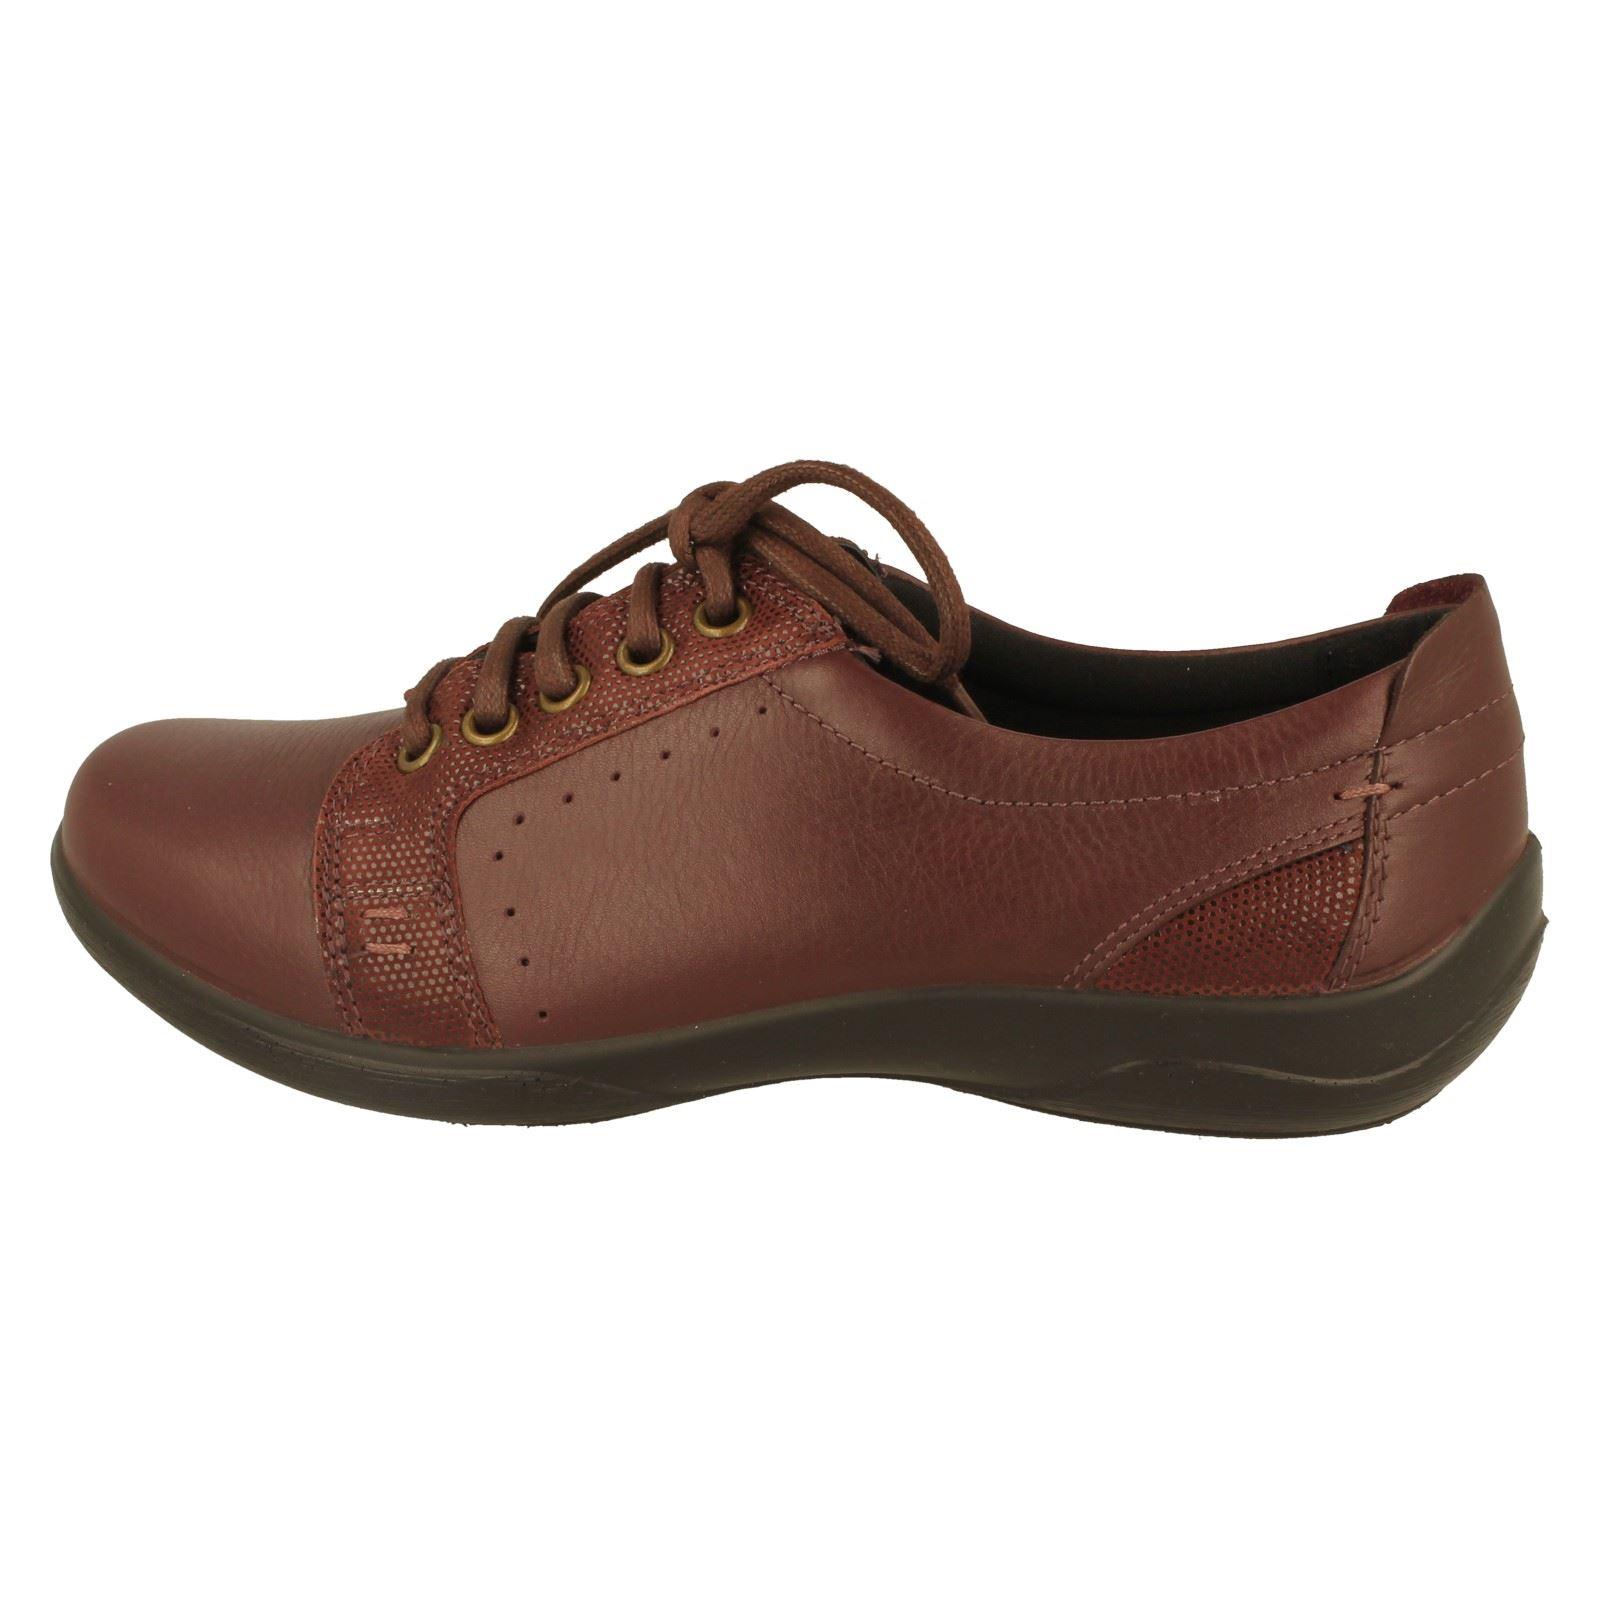 Damas Padders Doble estilo Montaje Informal Zapatos el estilo Doble Sonnet-W a01700